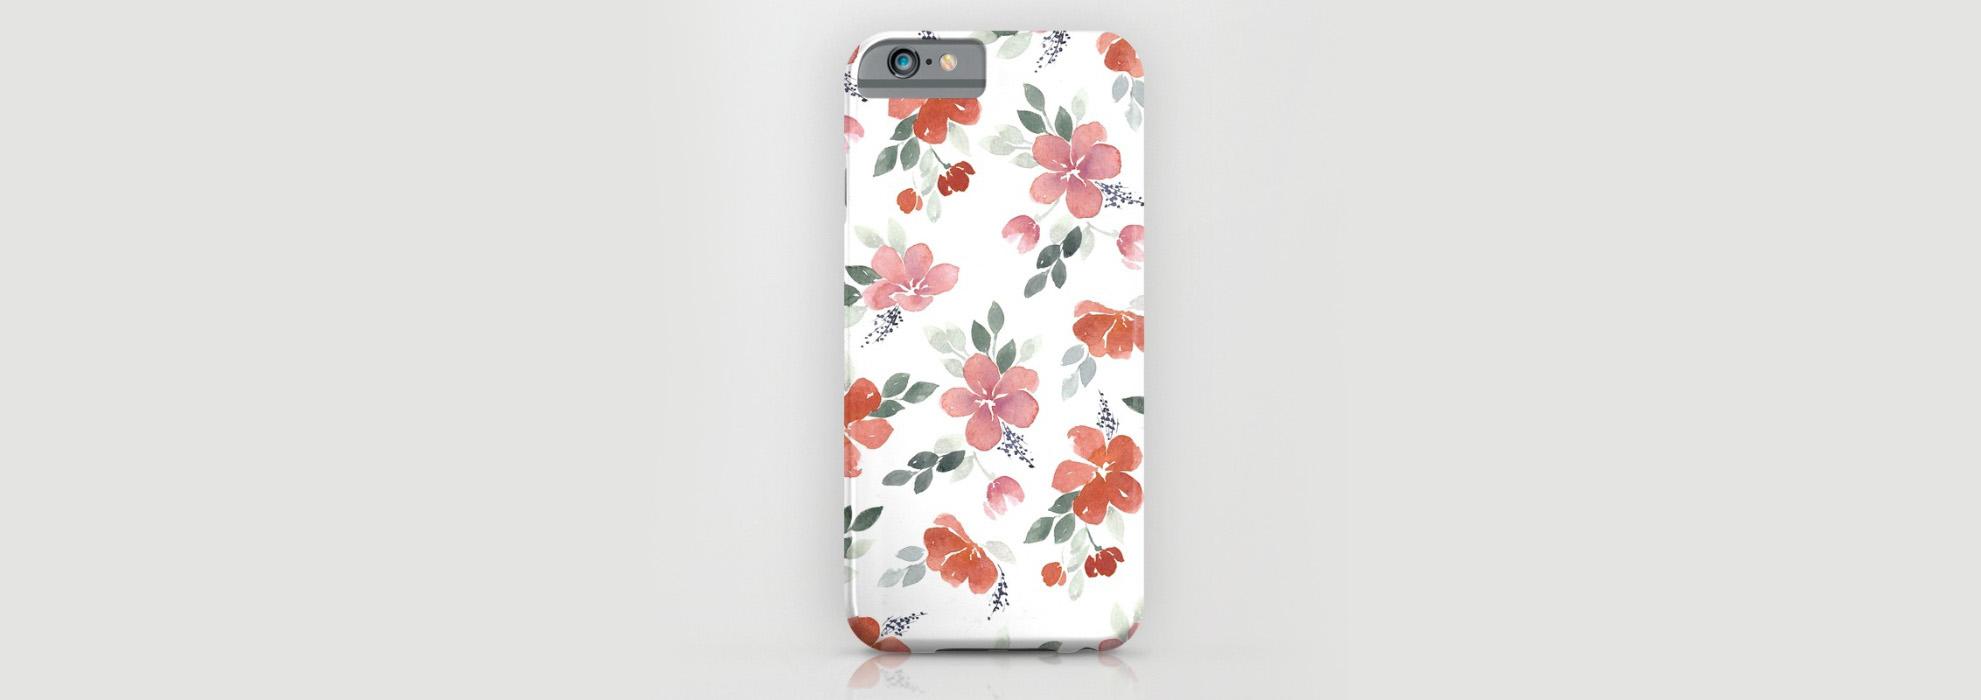 red-watercolor-floral-red-watercolor-flowers-watercolor-flower-pattern-cases.jpg